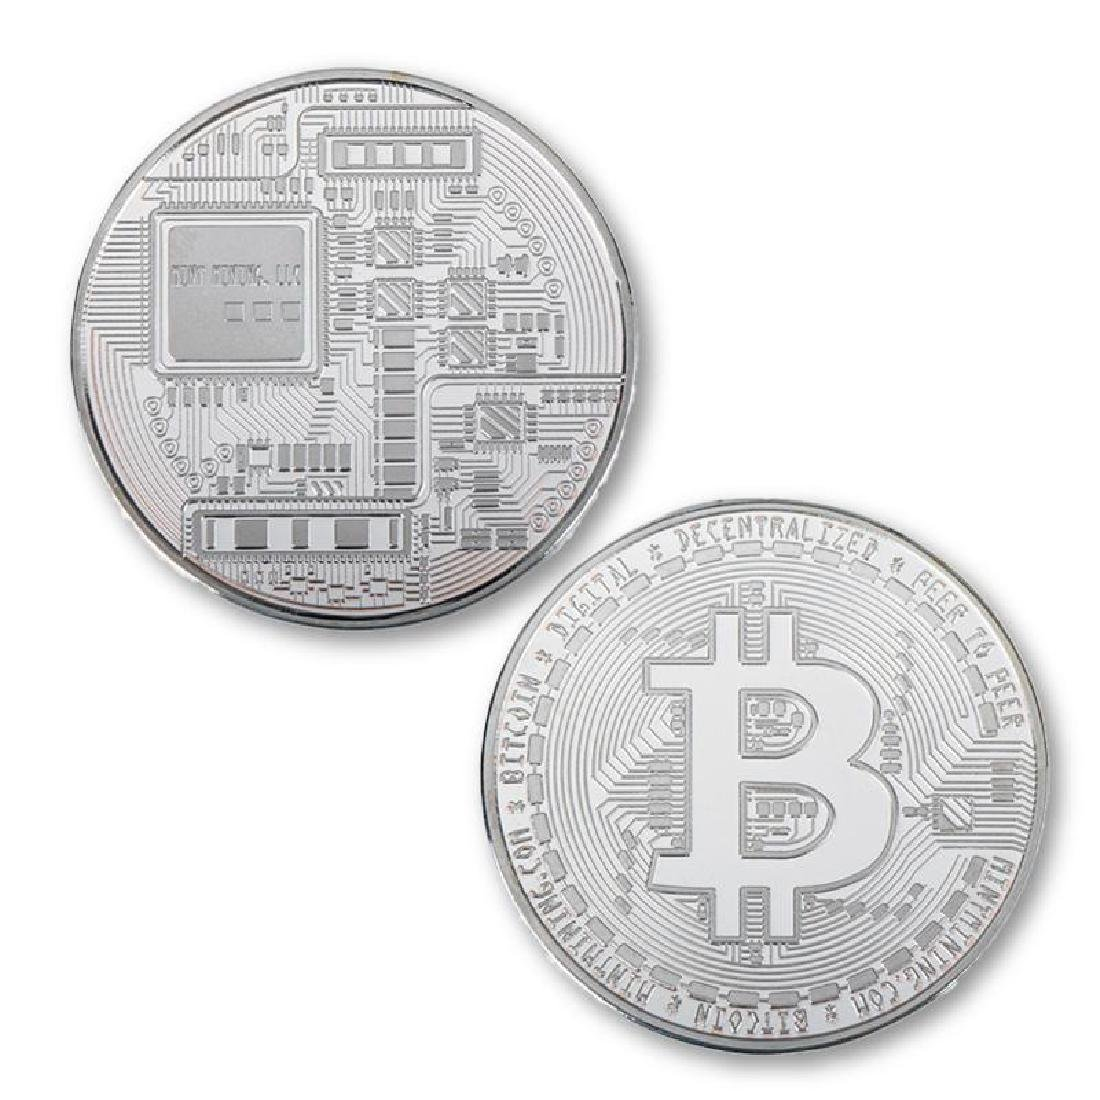 4 Bitcoin Silver and Gold Clad Collectible Coins - 4